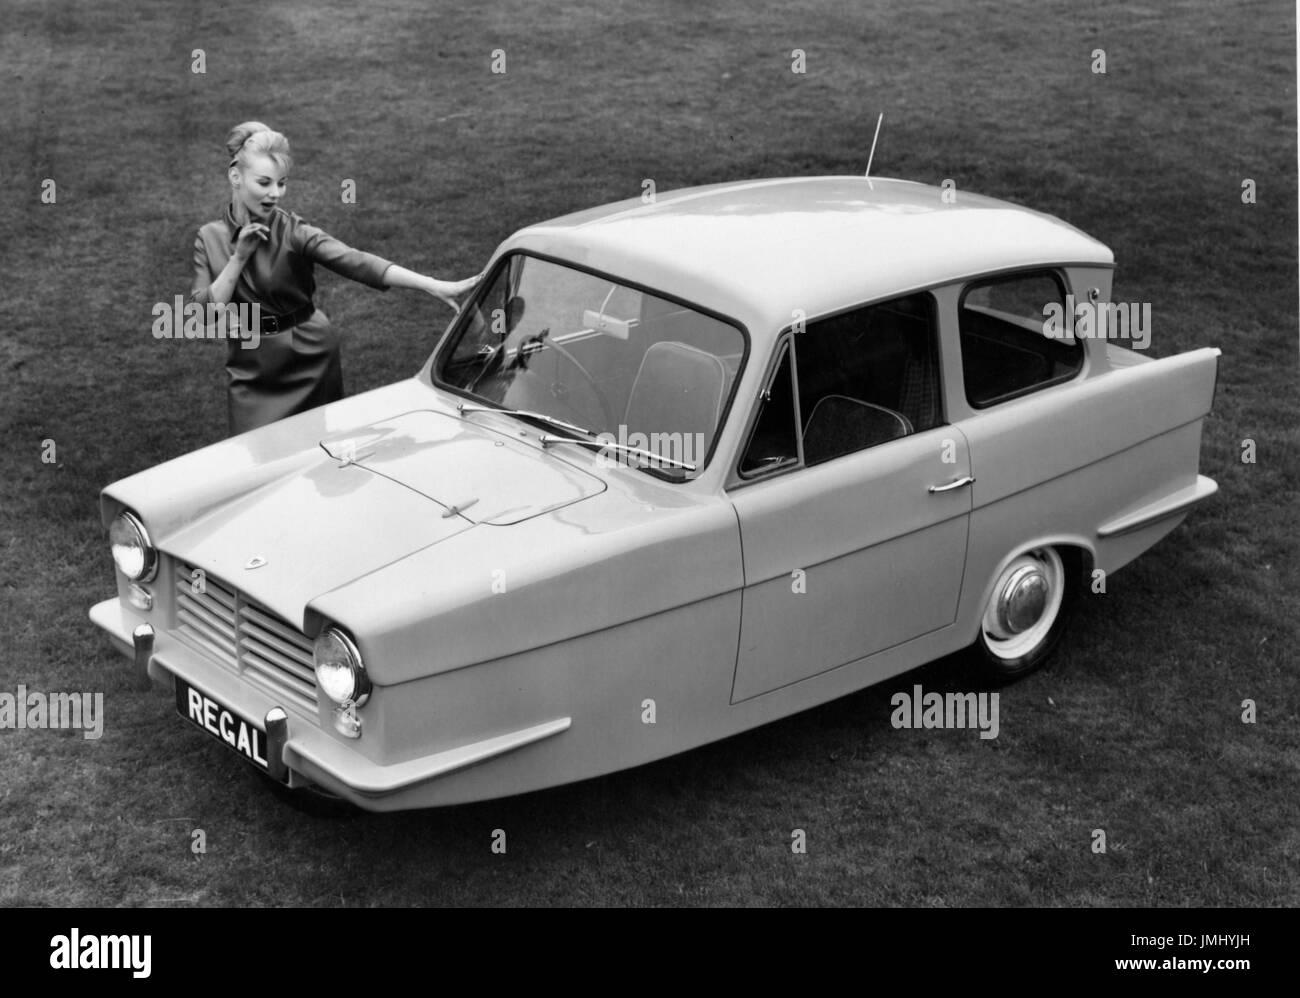 1962 Reliant Regal - Stock Image